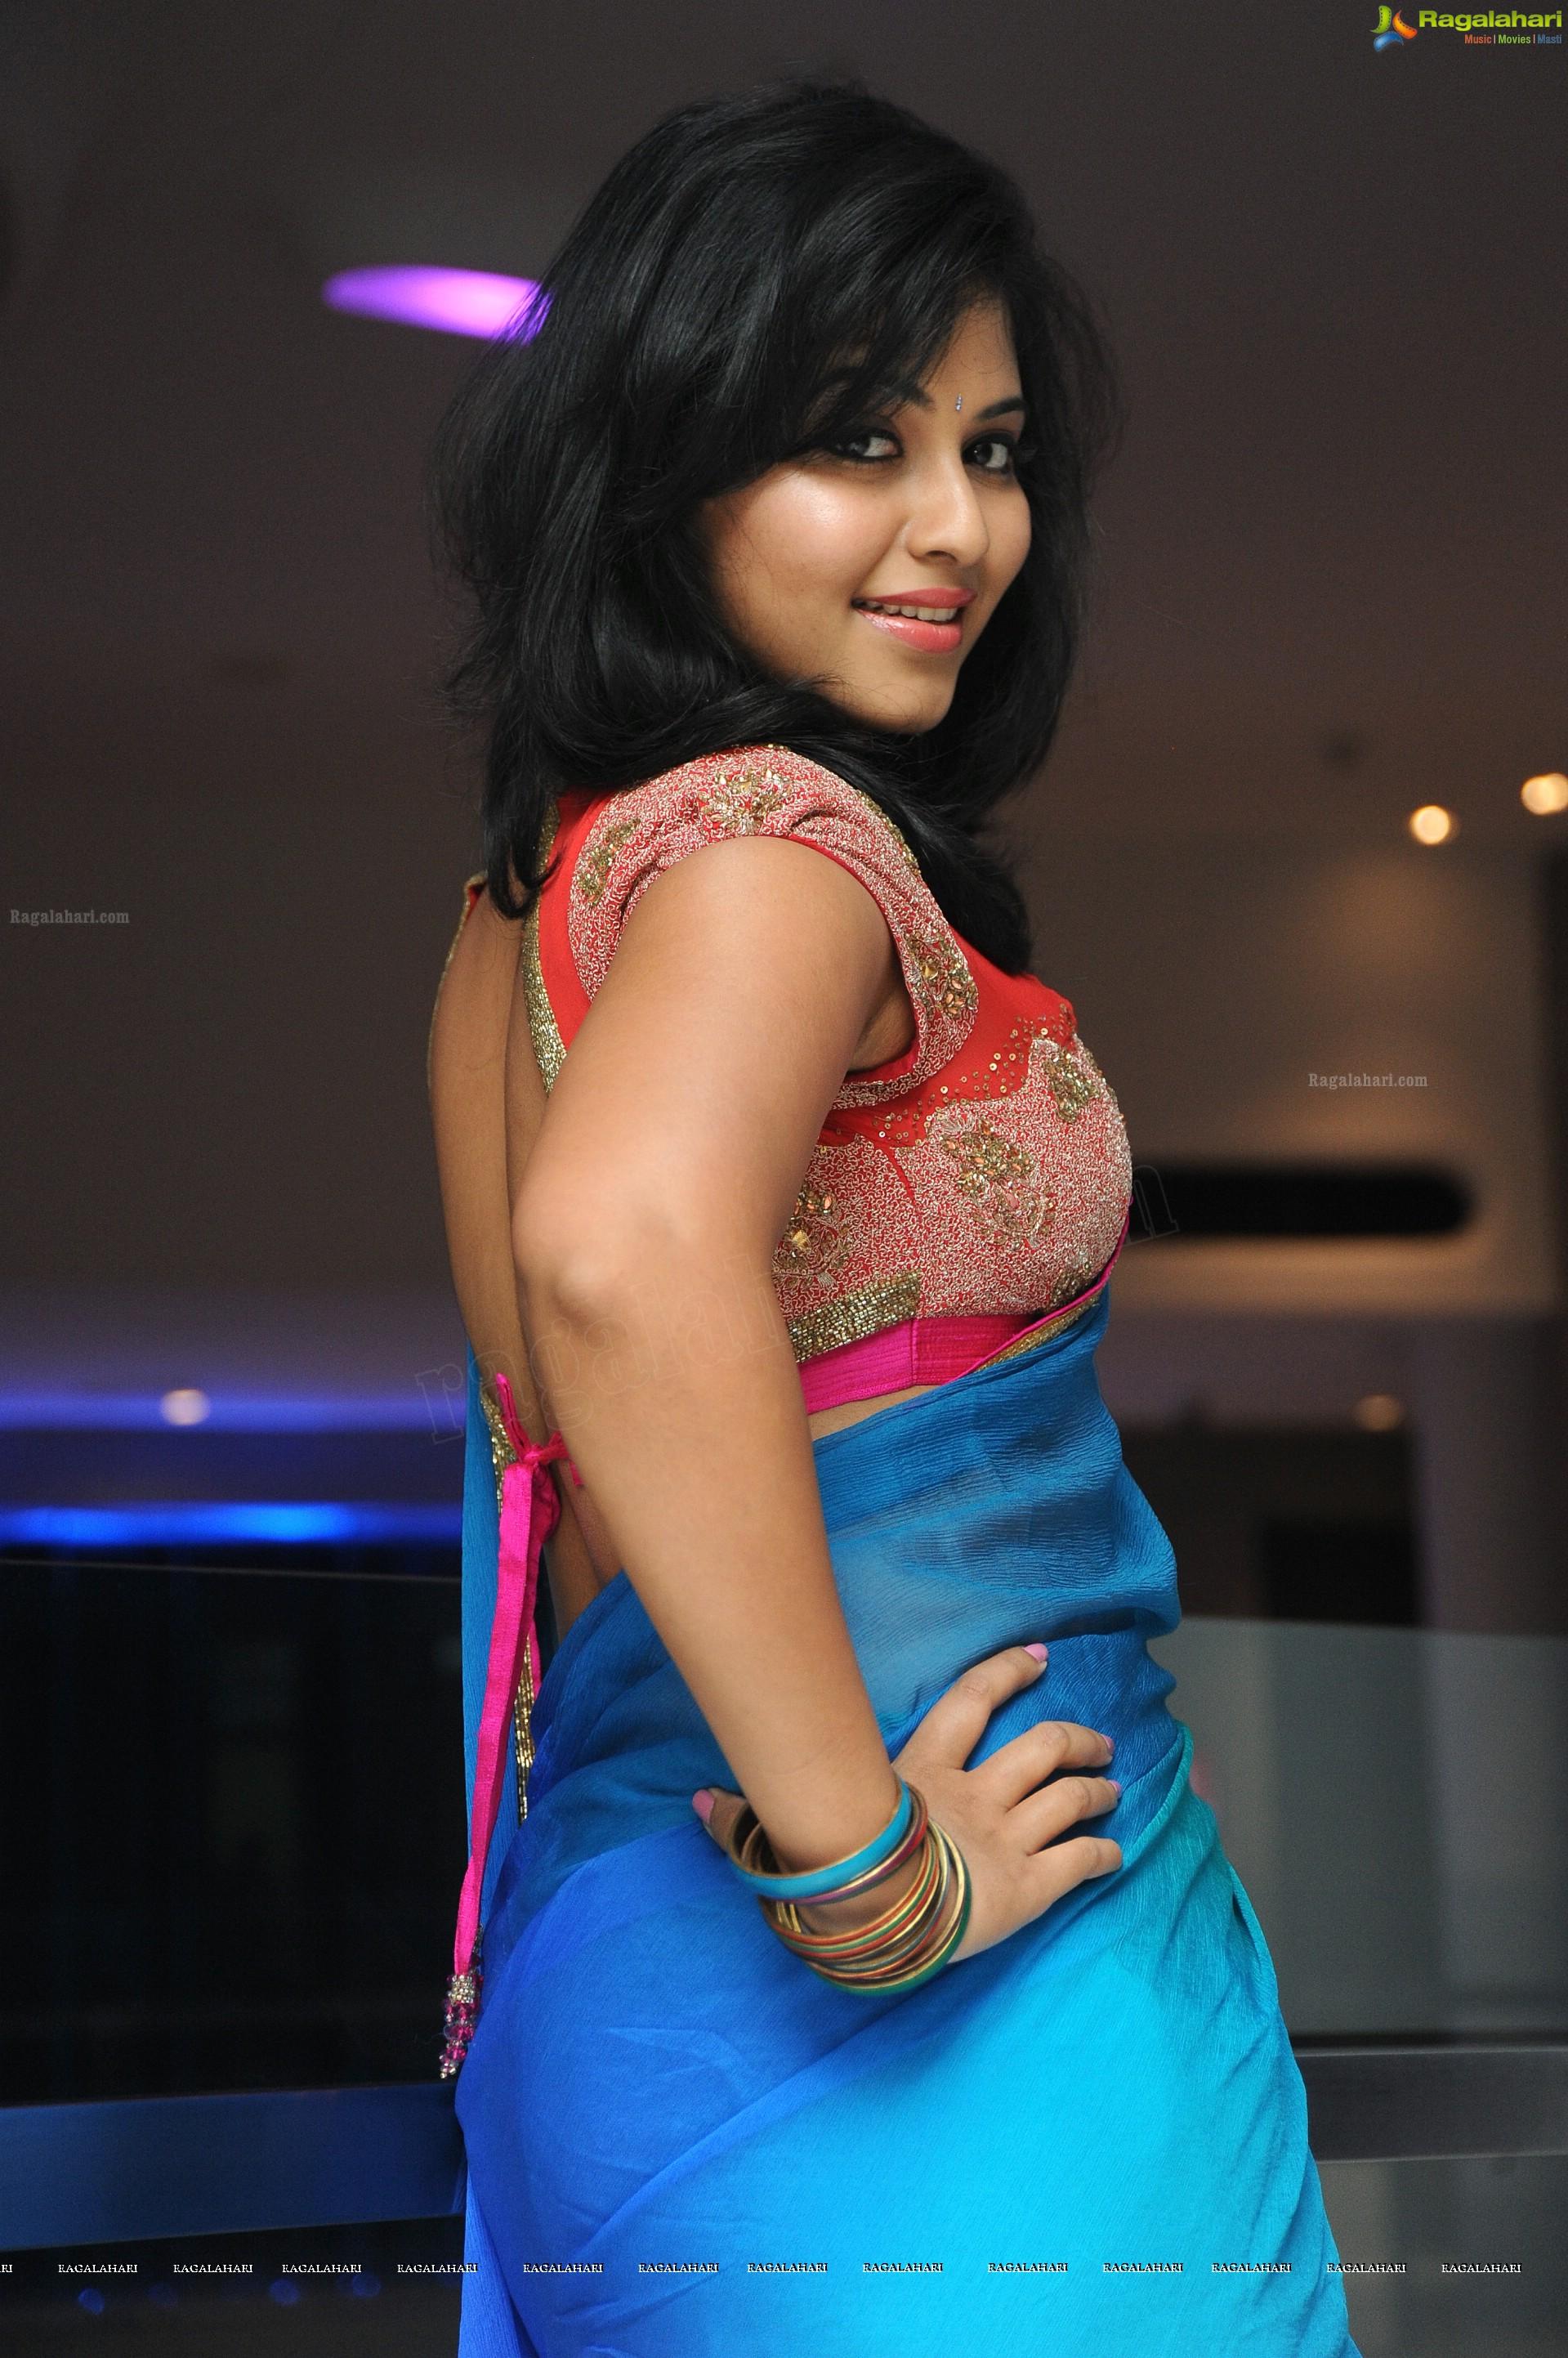 anjali (high definition) image 27 | beautiful tollywood actress